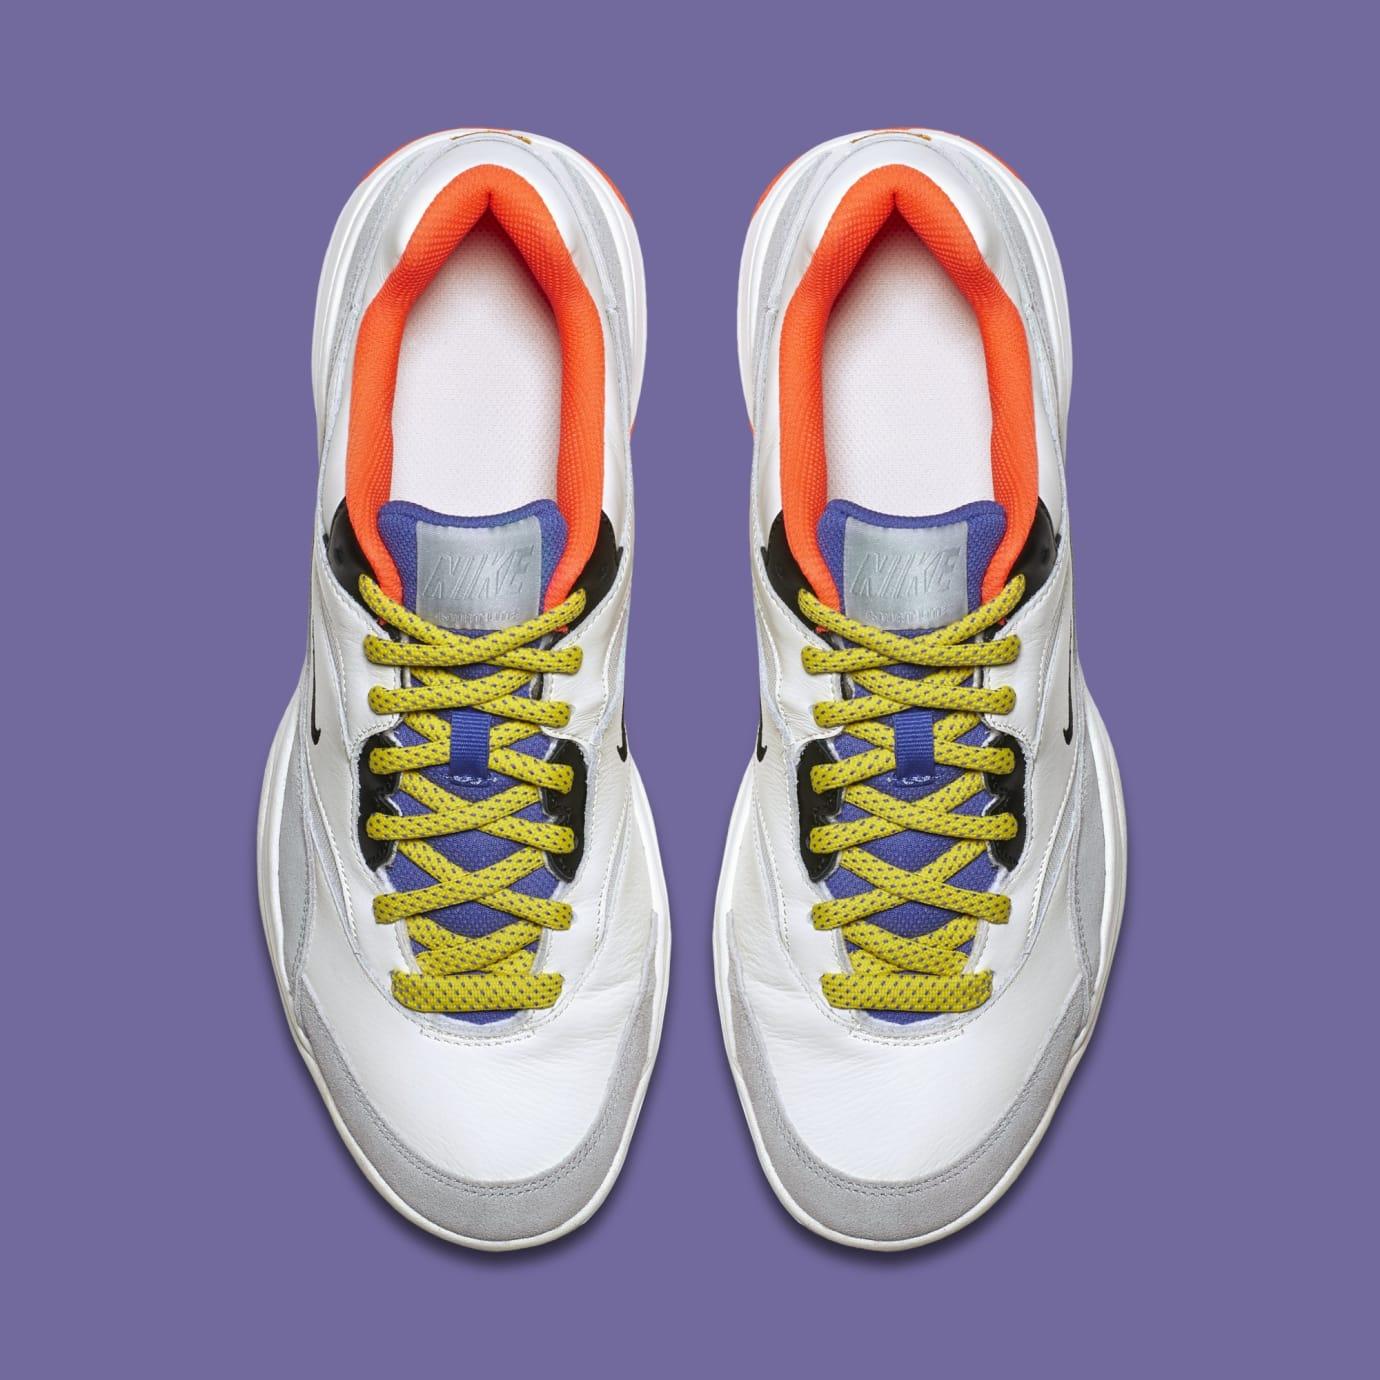 NikeCourt Court Lite 'NYC' AR6342-100 (Top)